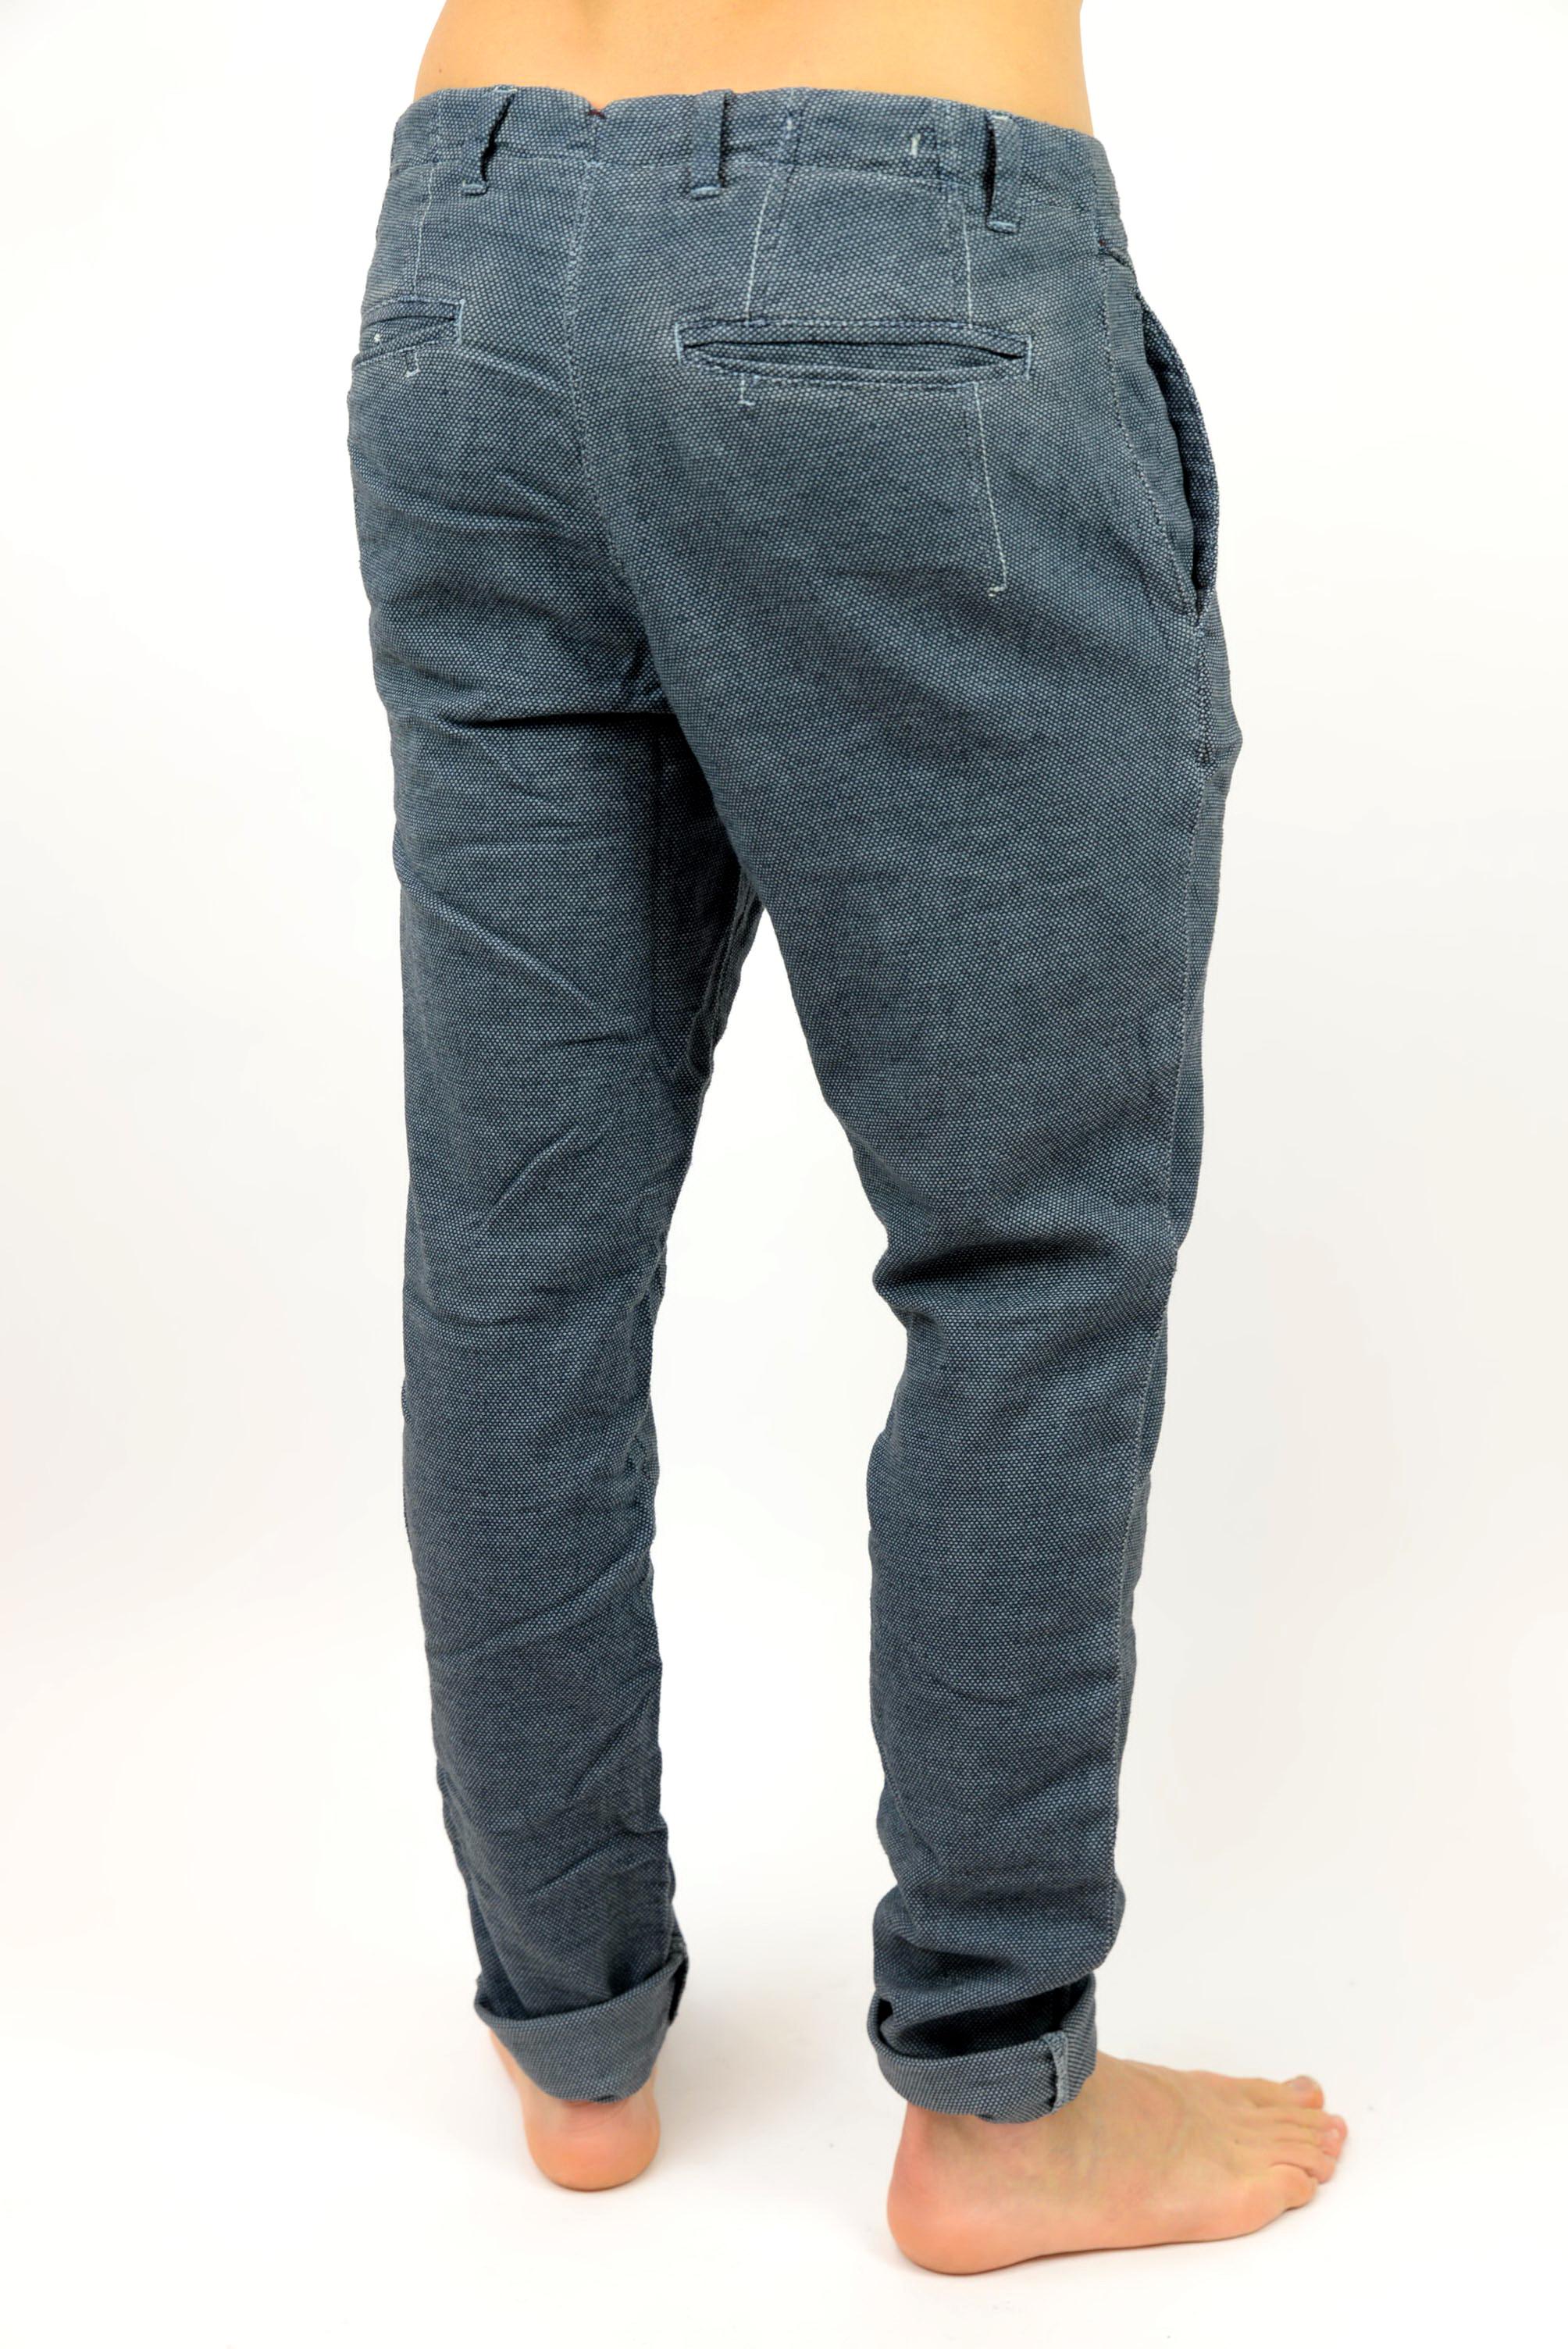 c578702e09 Pantalone cotone morbido e leggero di Jack & Jones - Pantaloni Uomo ...